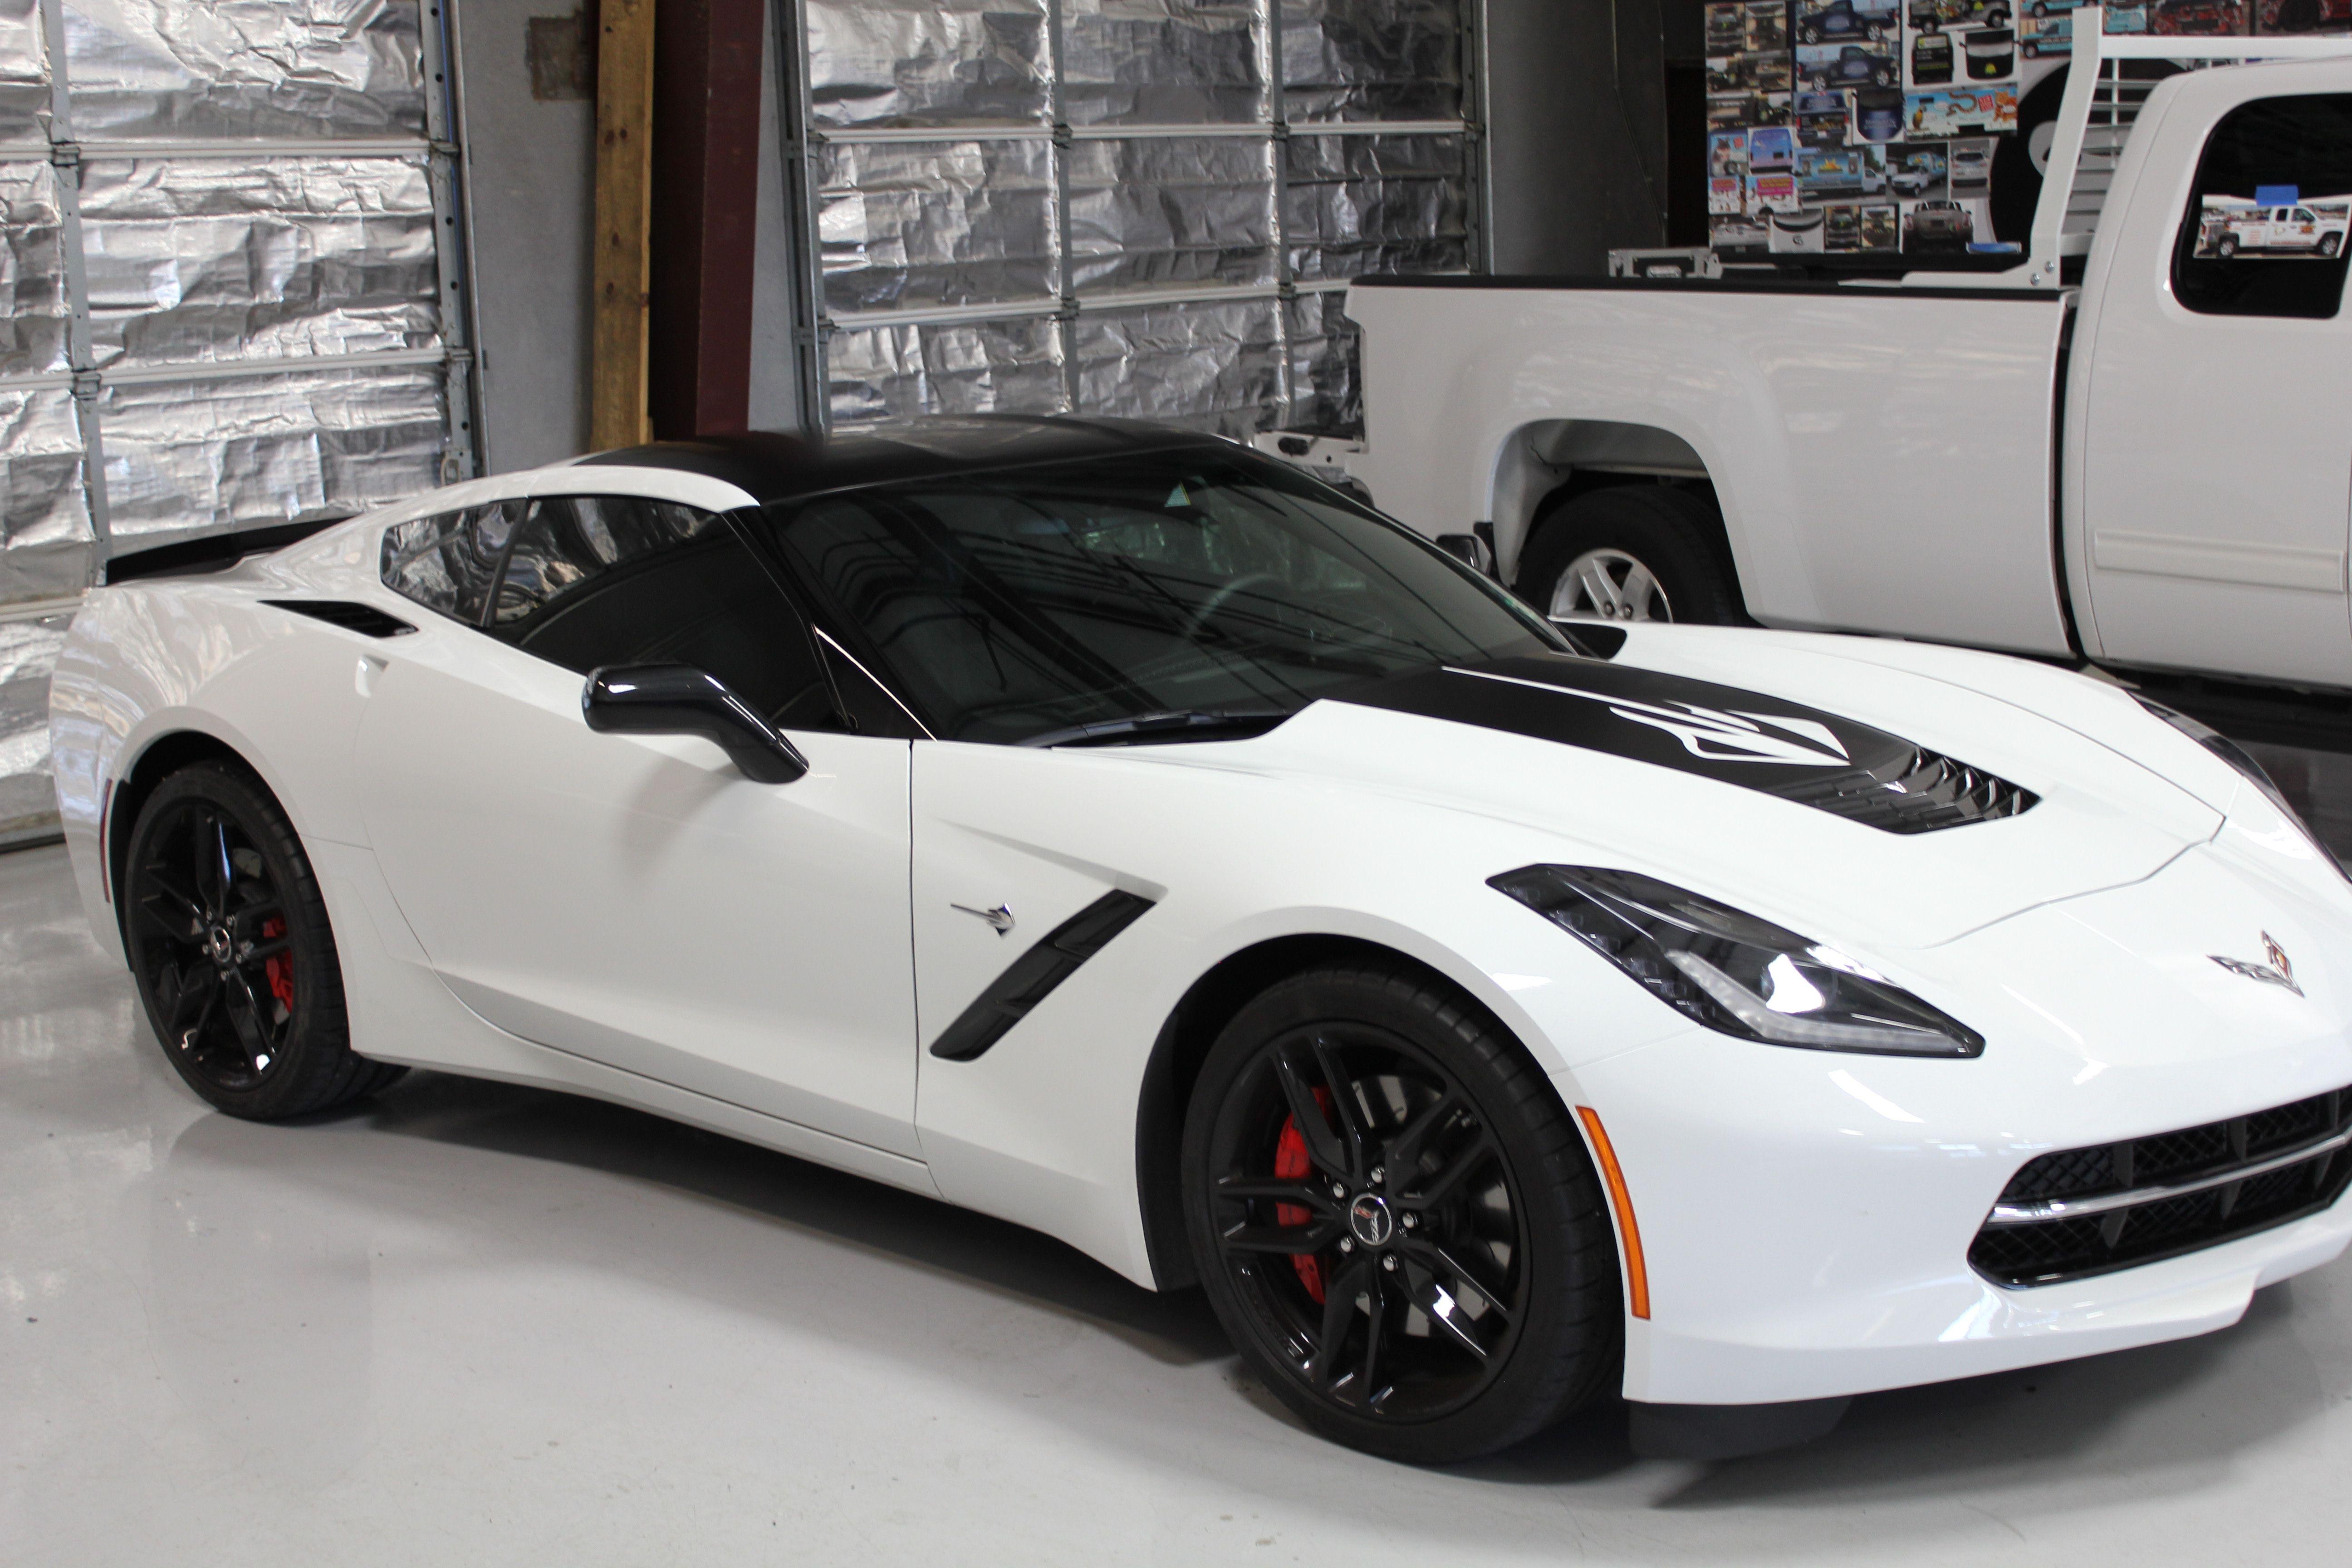 Black and white corvette white corvette black corvette